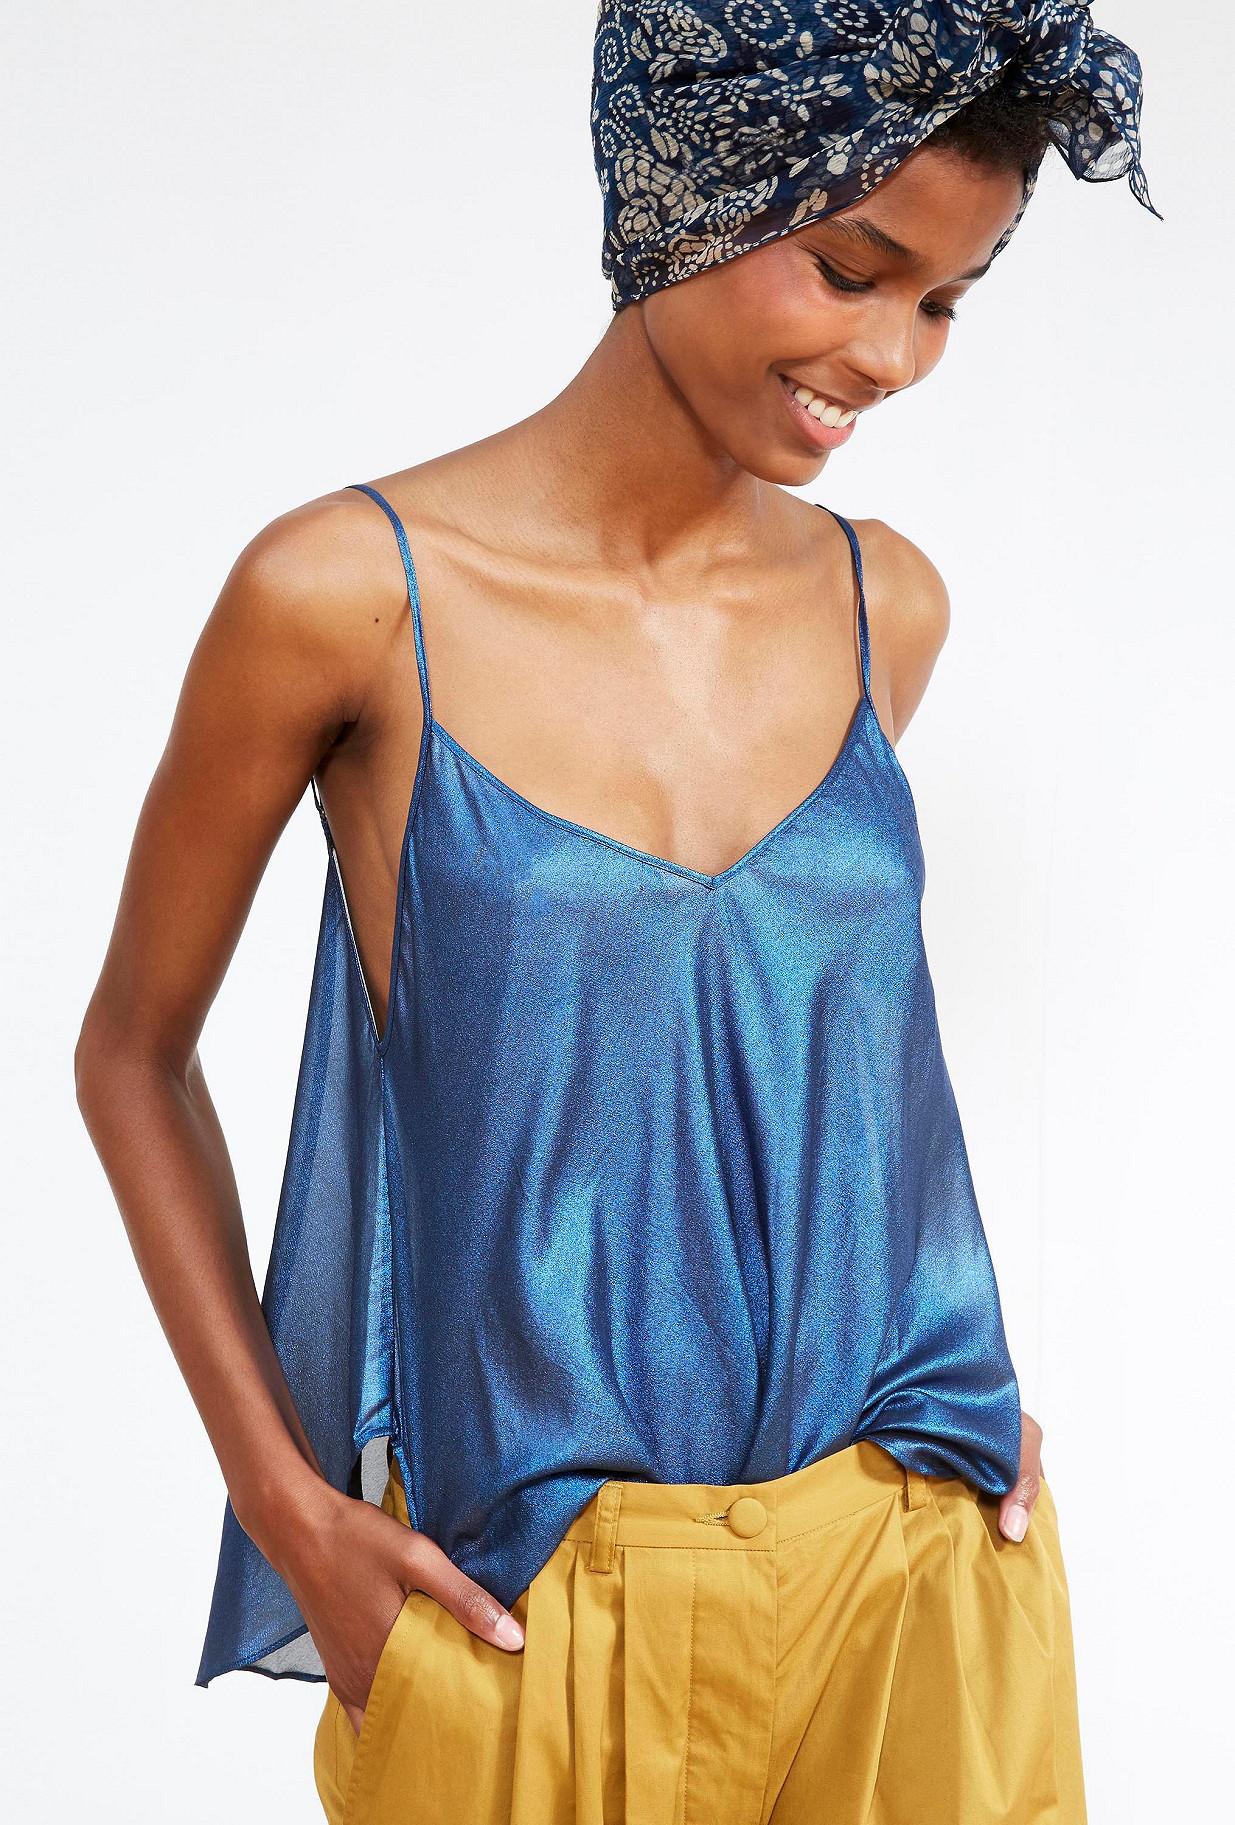 Silver  TOP  Starla Mes demoiselles fashion clothes designer Paris